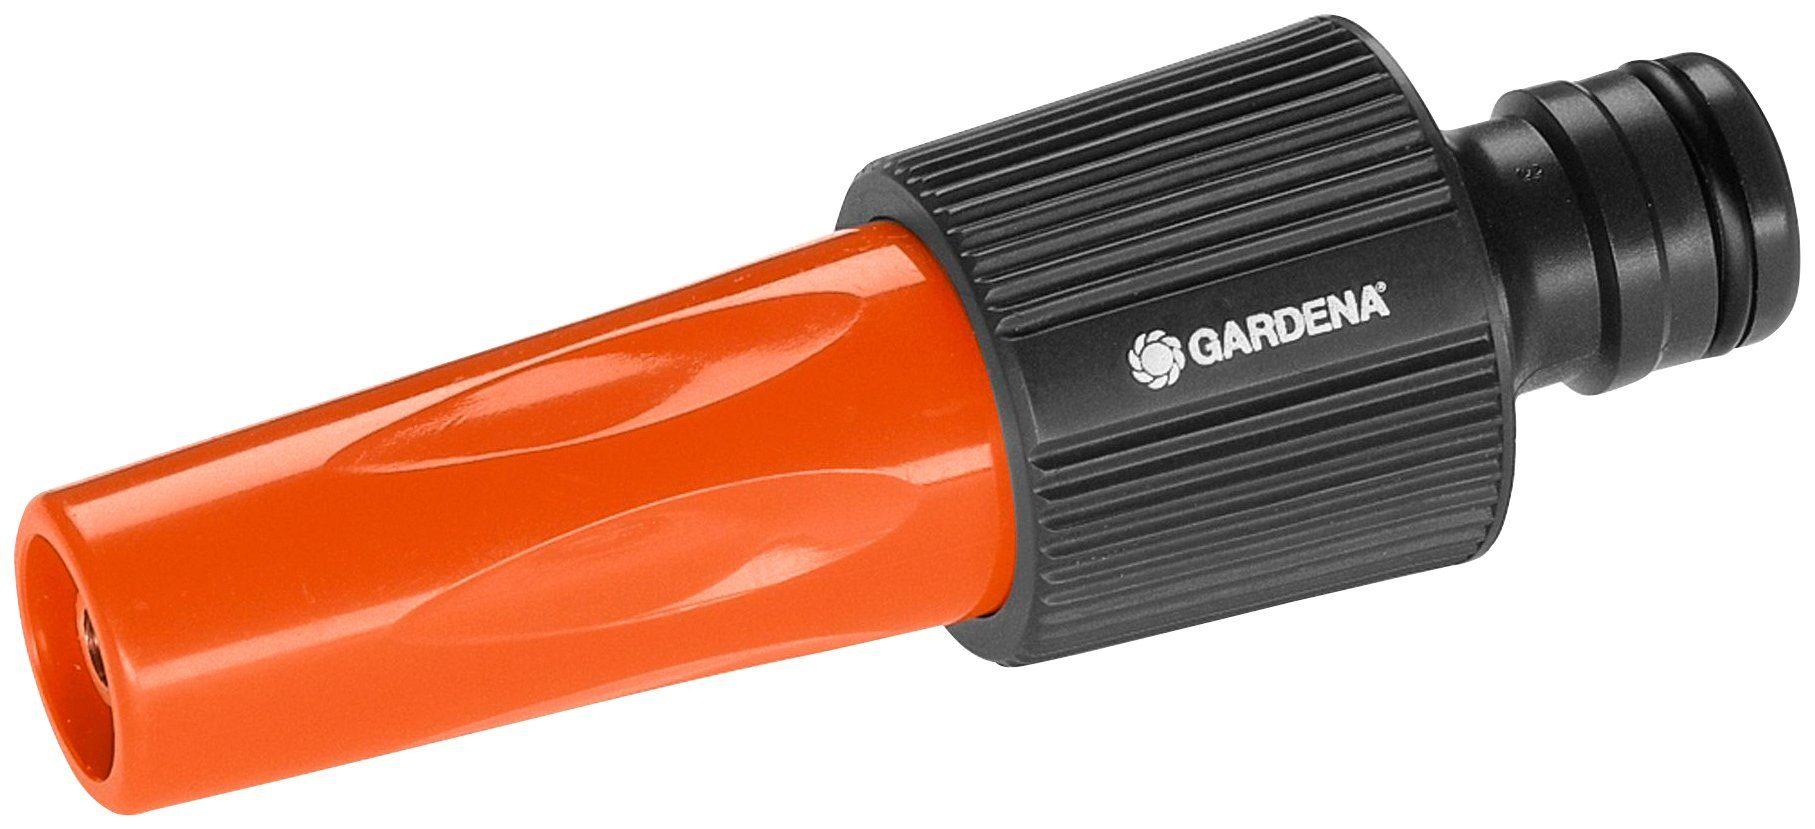 GARDENA Systemspritze »02818-20«, Stufenlos regulierbar